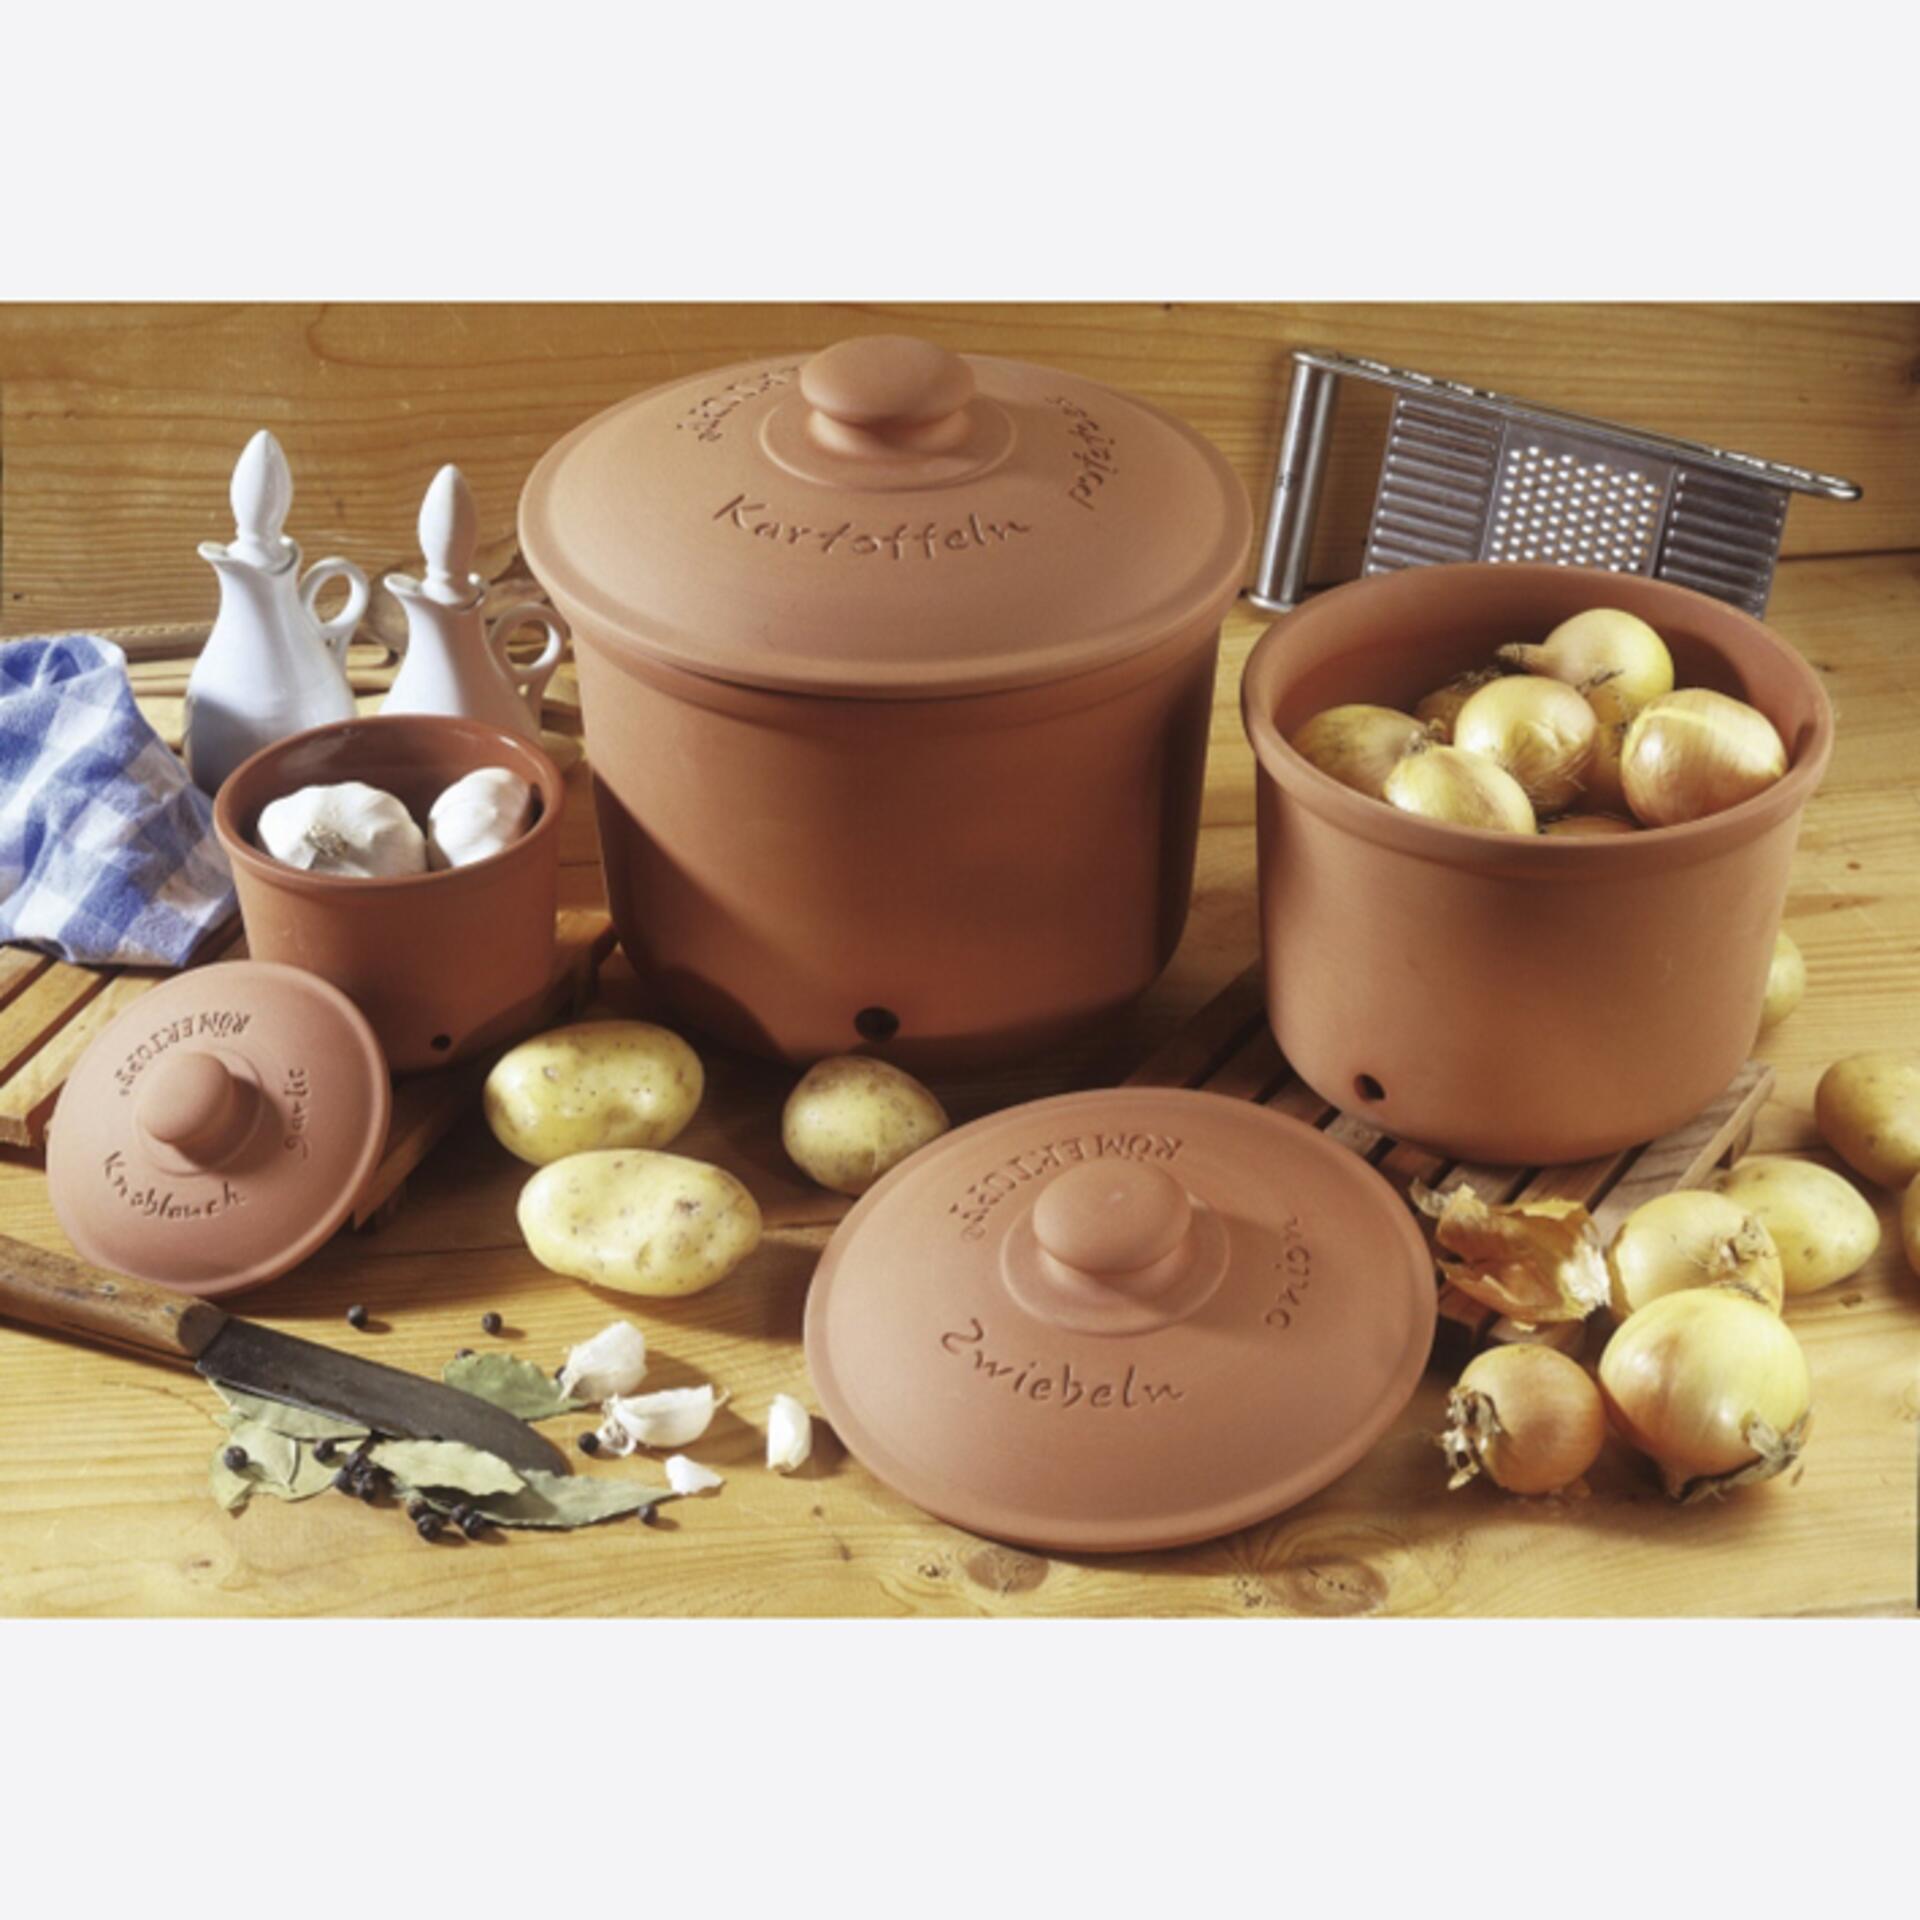 Römertopf Vorratstopf für Kartoffeln